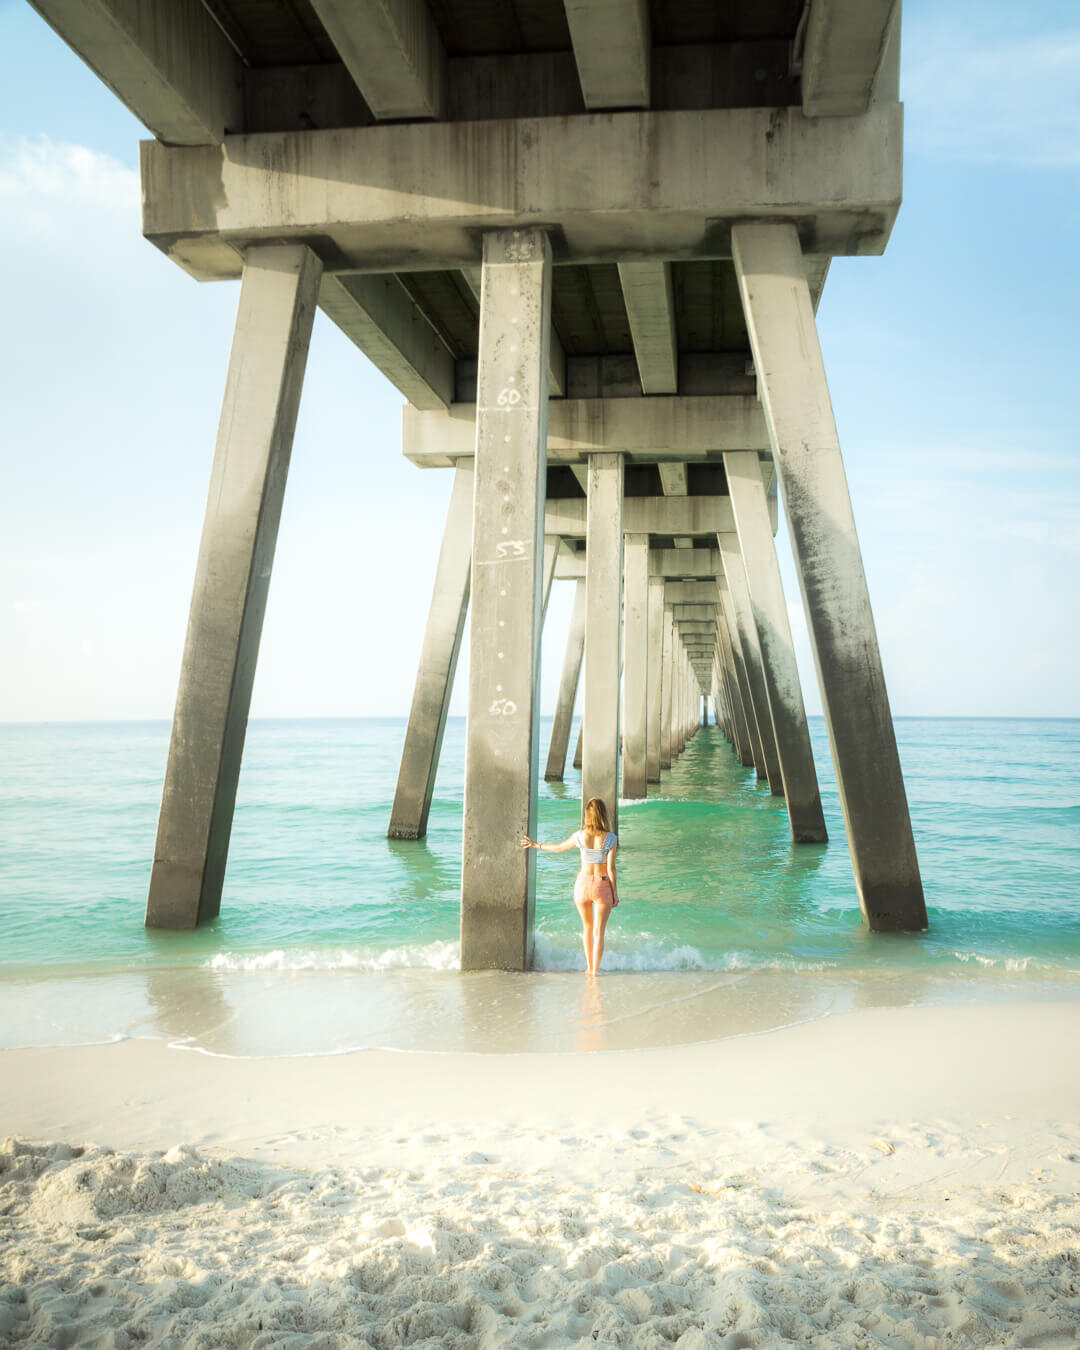 The peer at Navarre Beach, Florida.